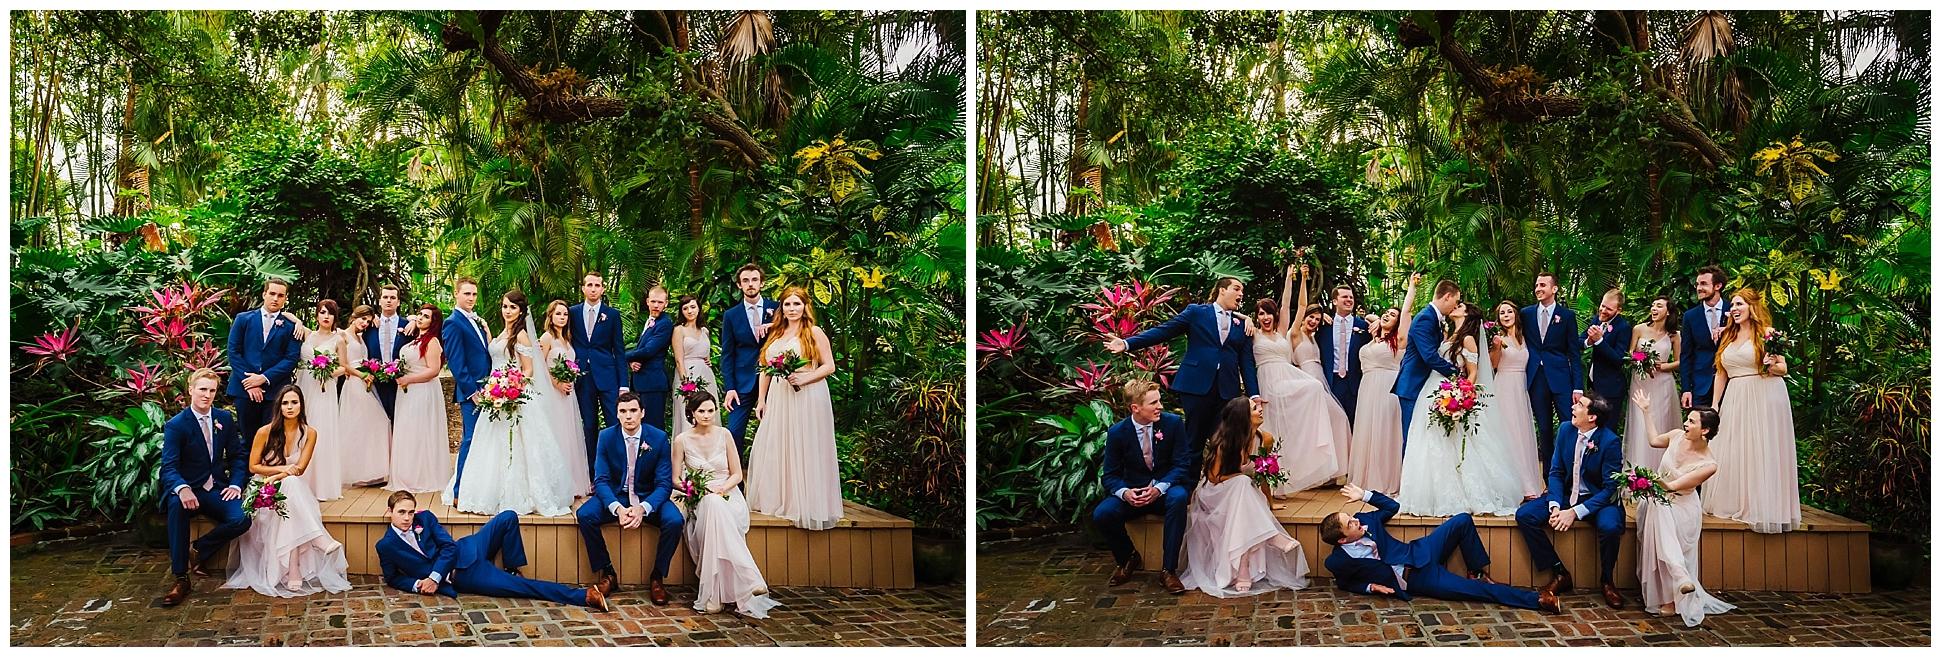 st-pete-wedding-photographer-sunken-gardens-crystal-ballroom-princess-dancer_0168.jpg